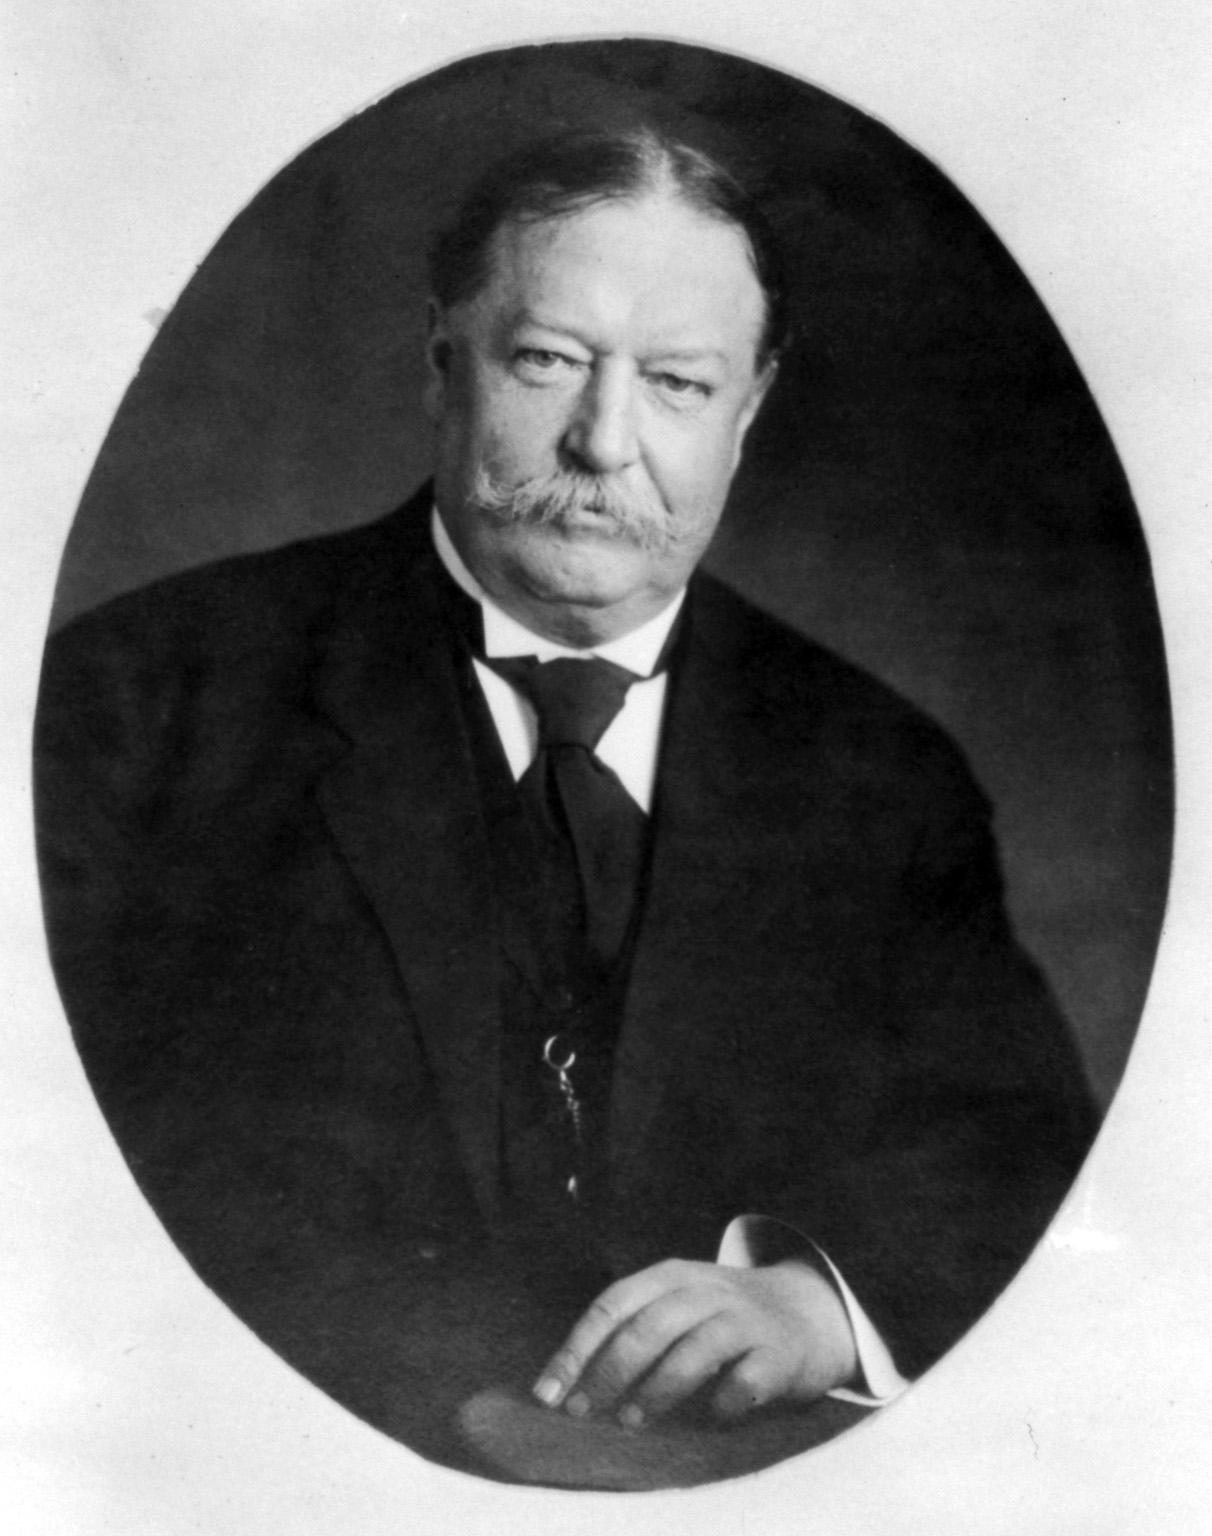 Description William Howard Taft cph 3a01965 jpgWilliam Taft